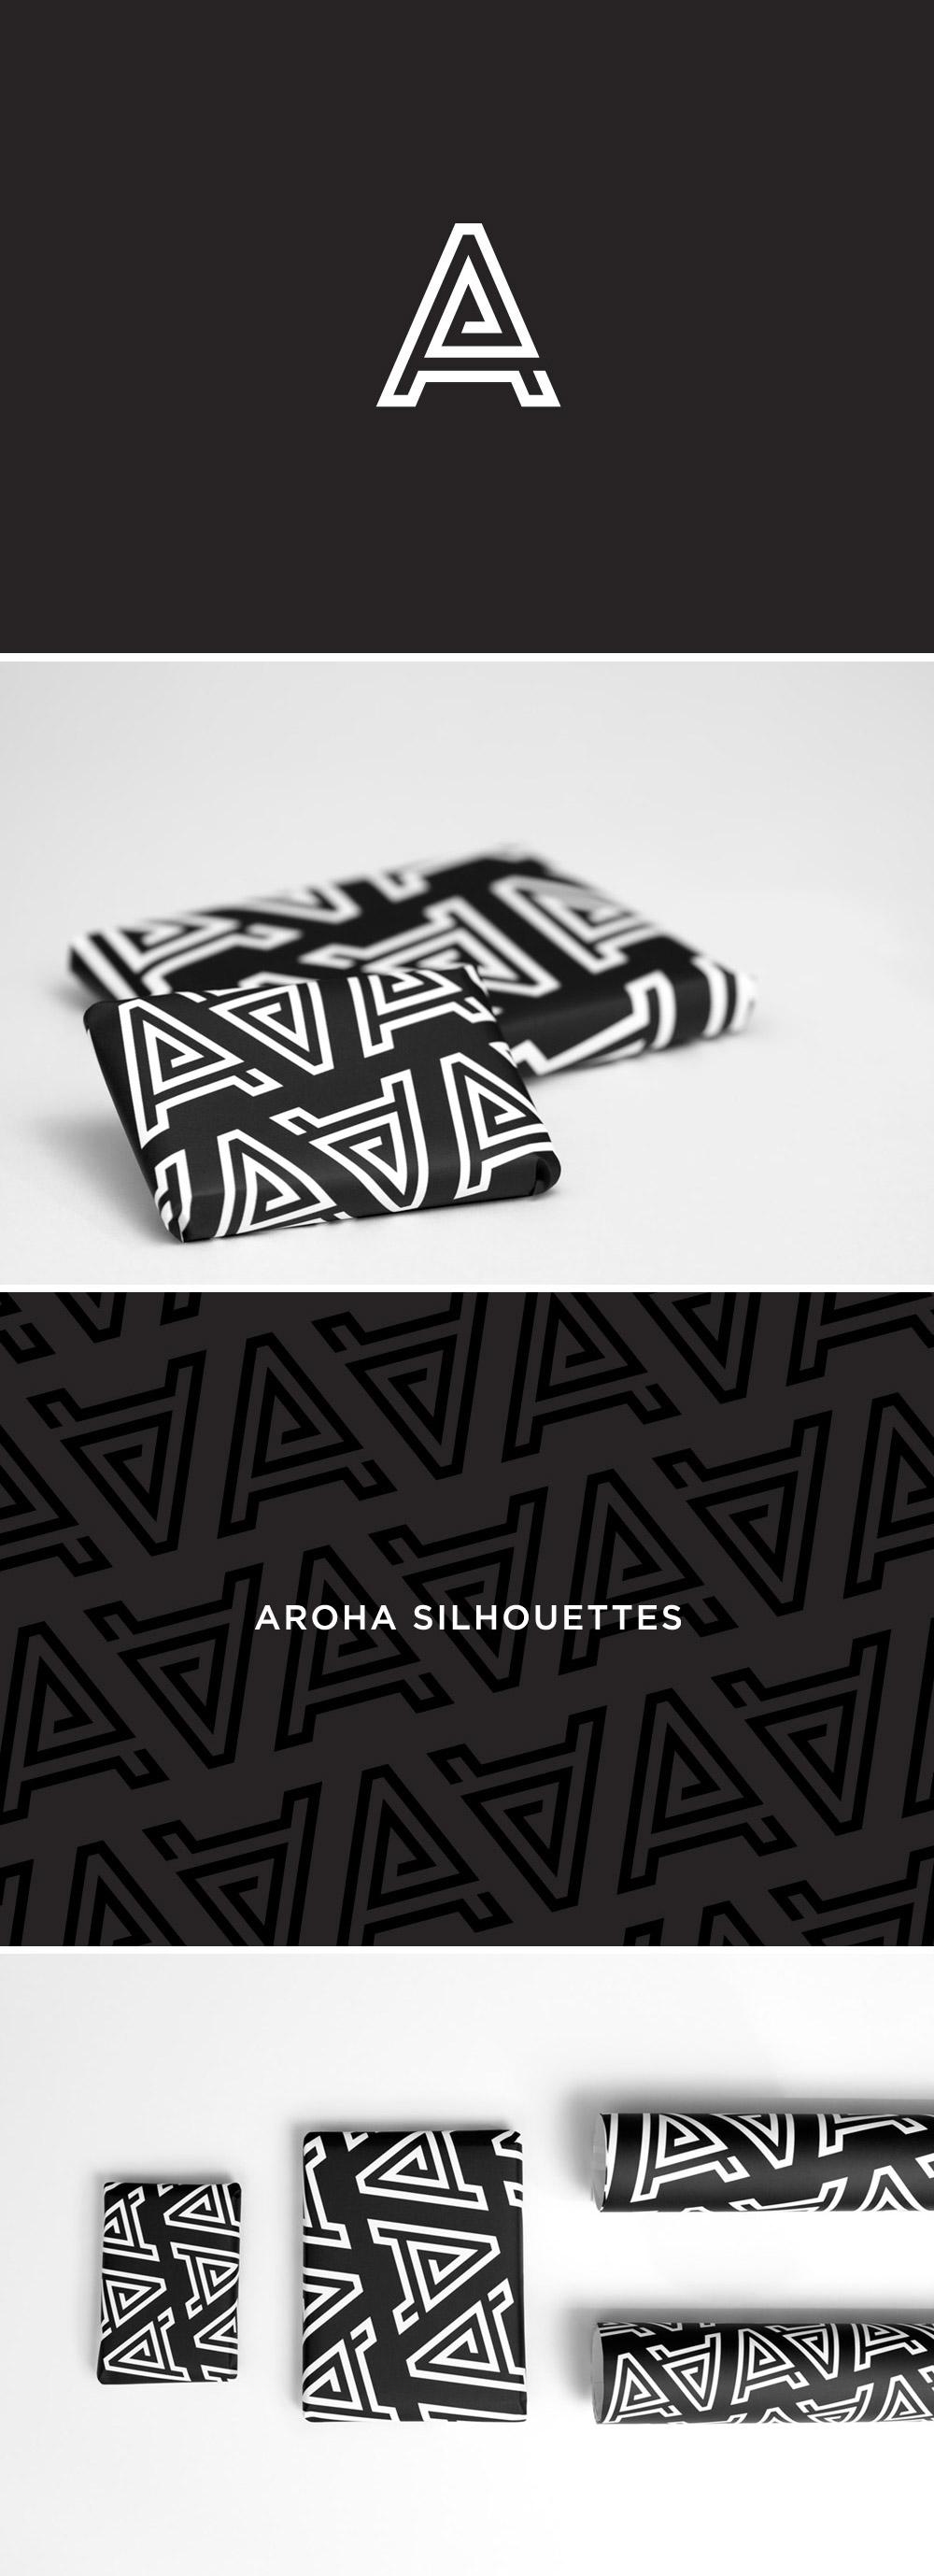 Branch | Aroha Silhouettes Gift Wrap